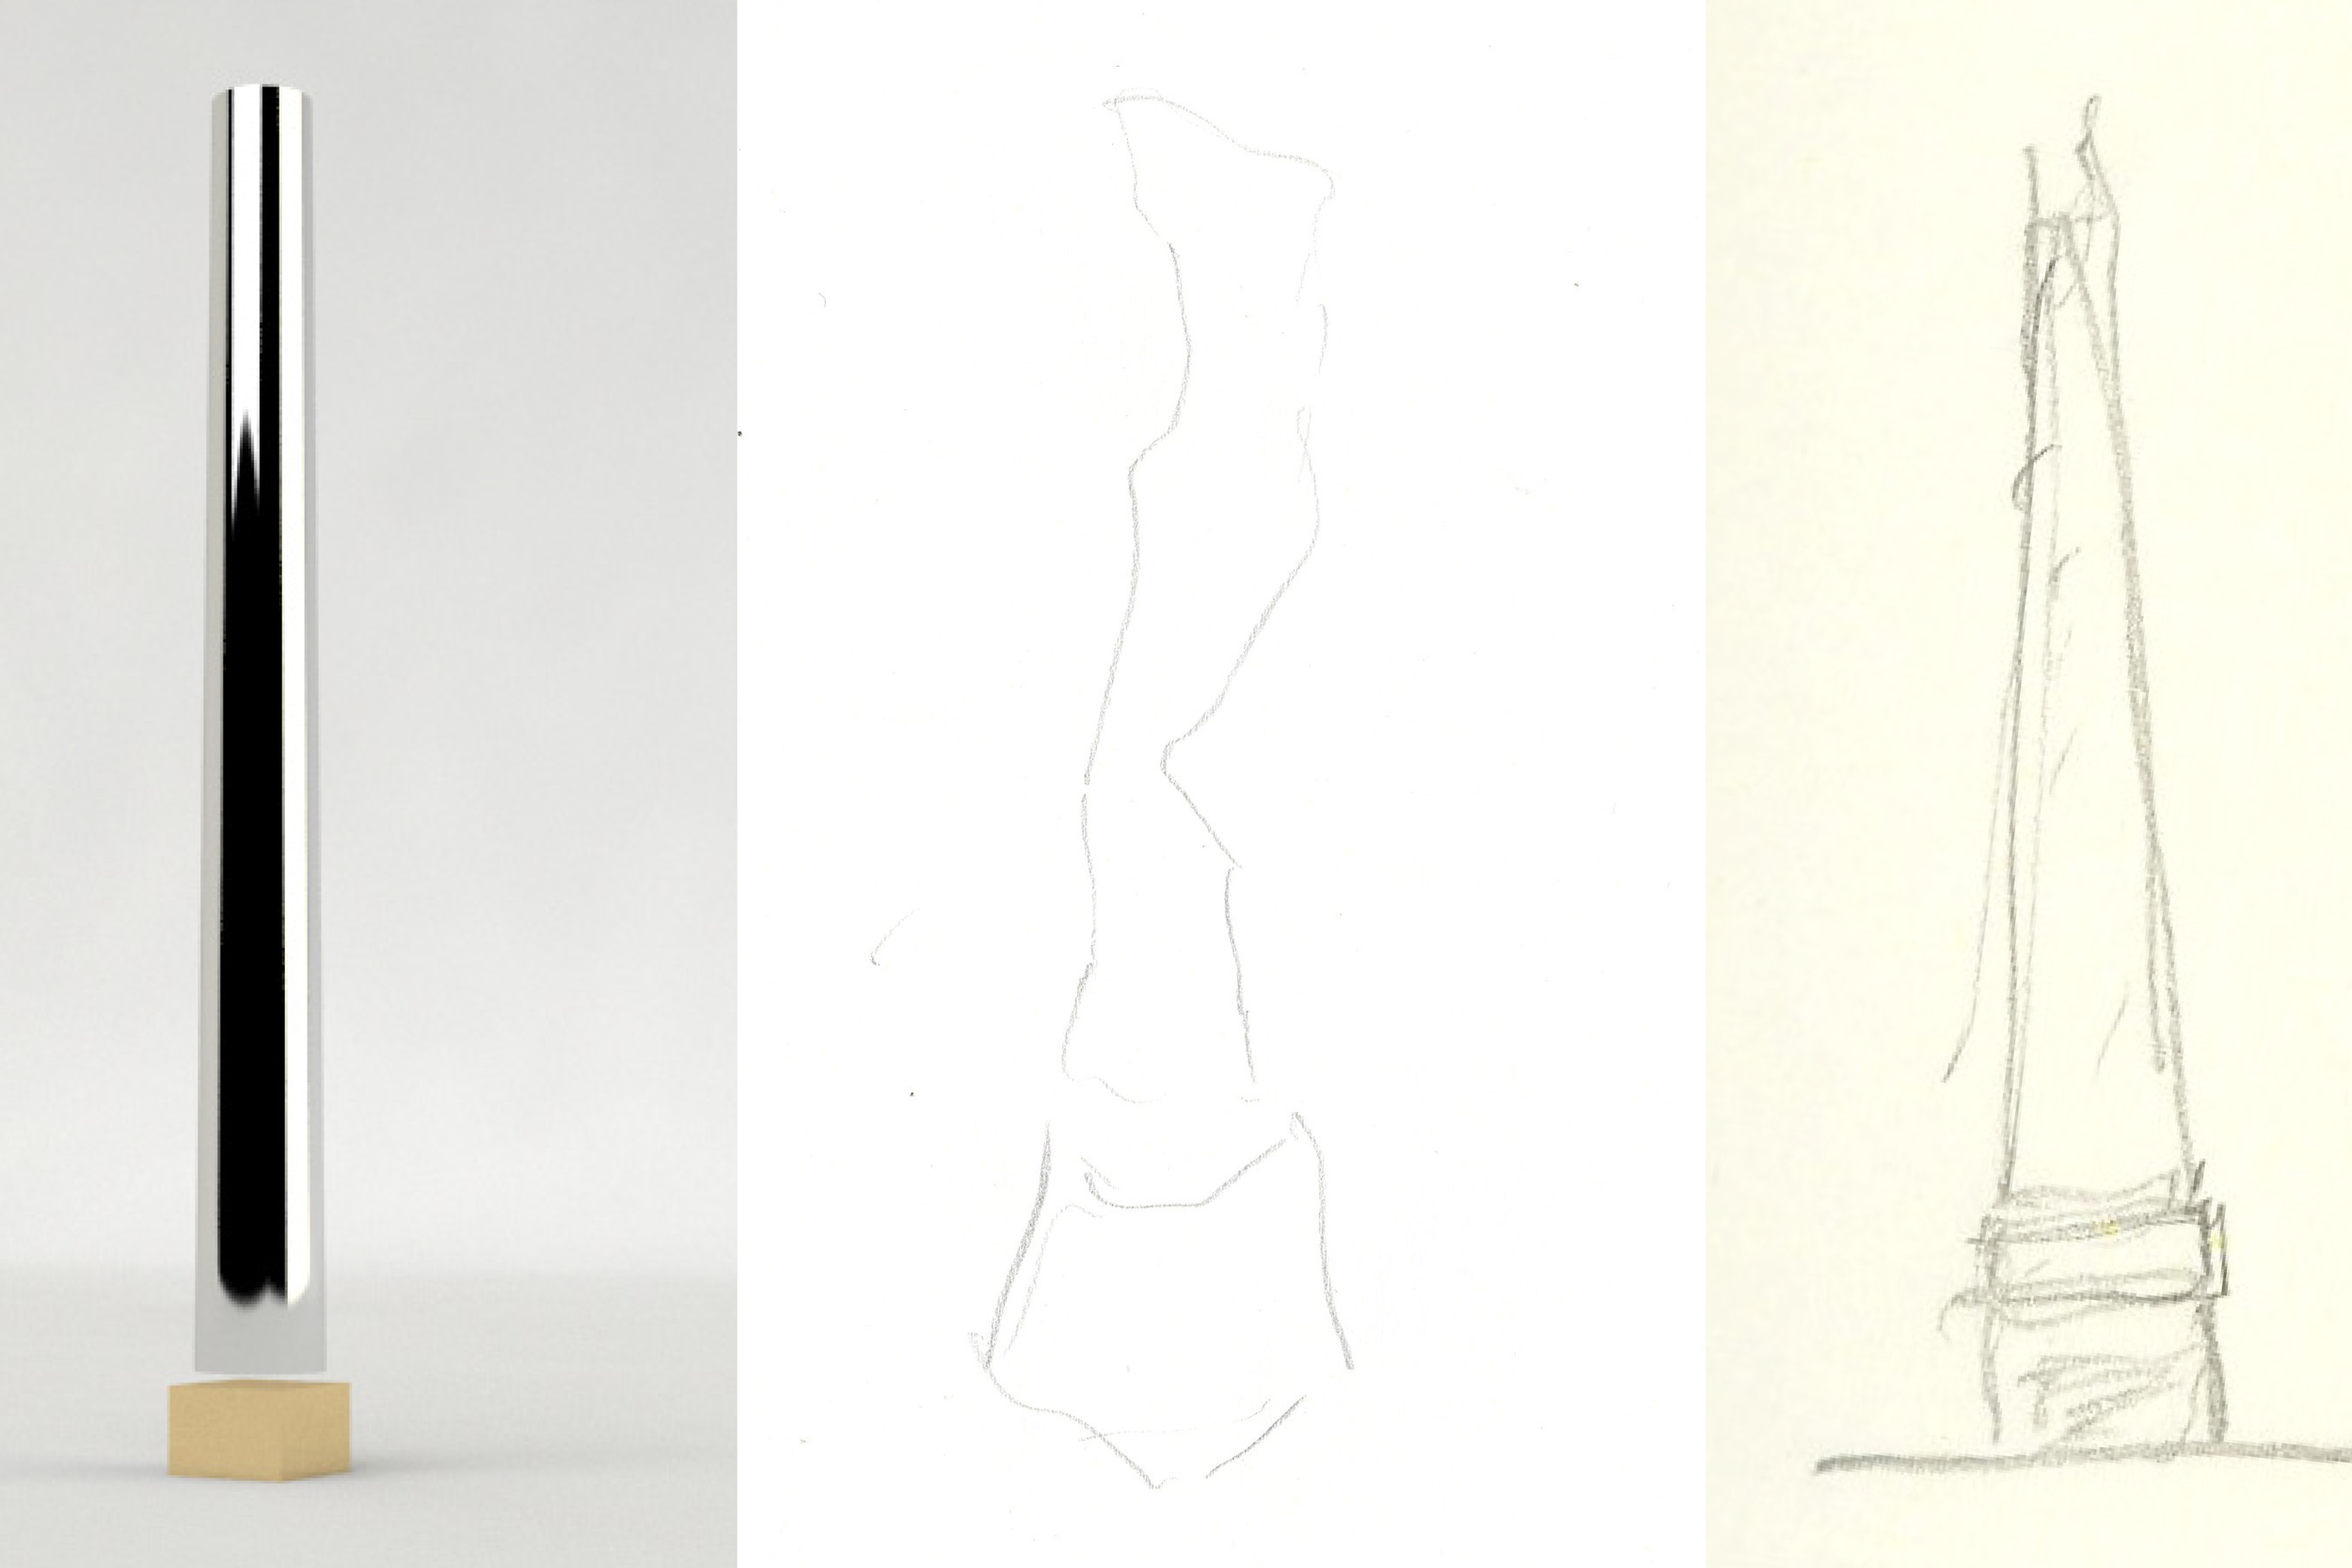 dtc-web_mir-process_sketch02.jpg